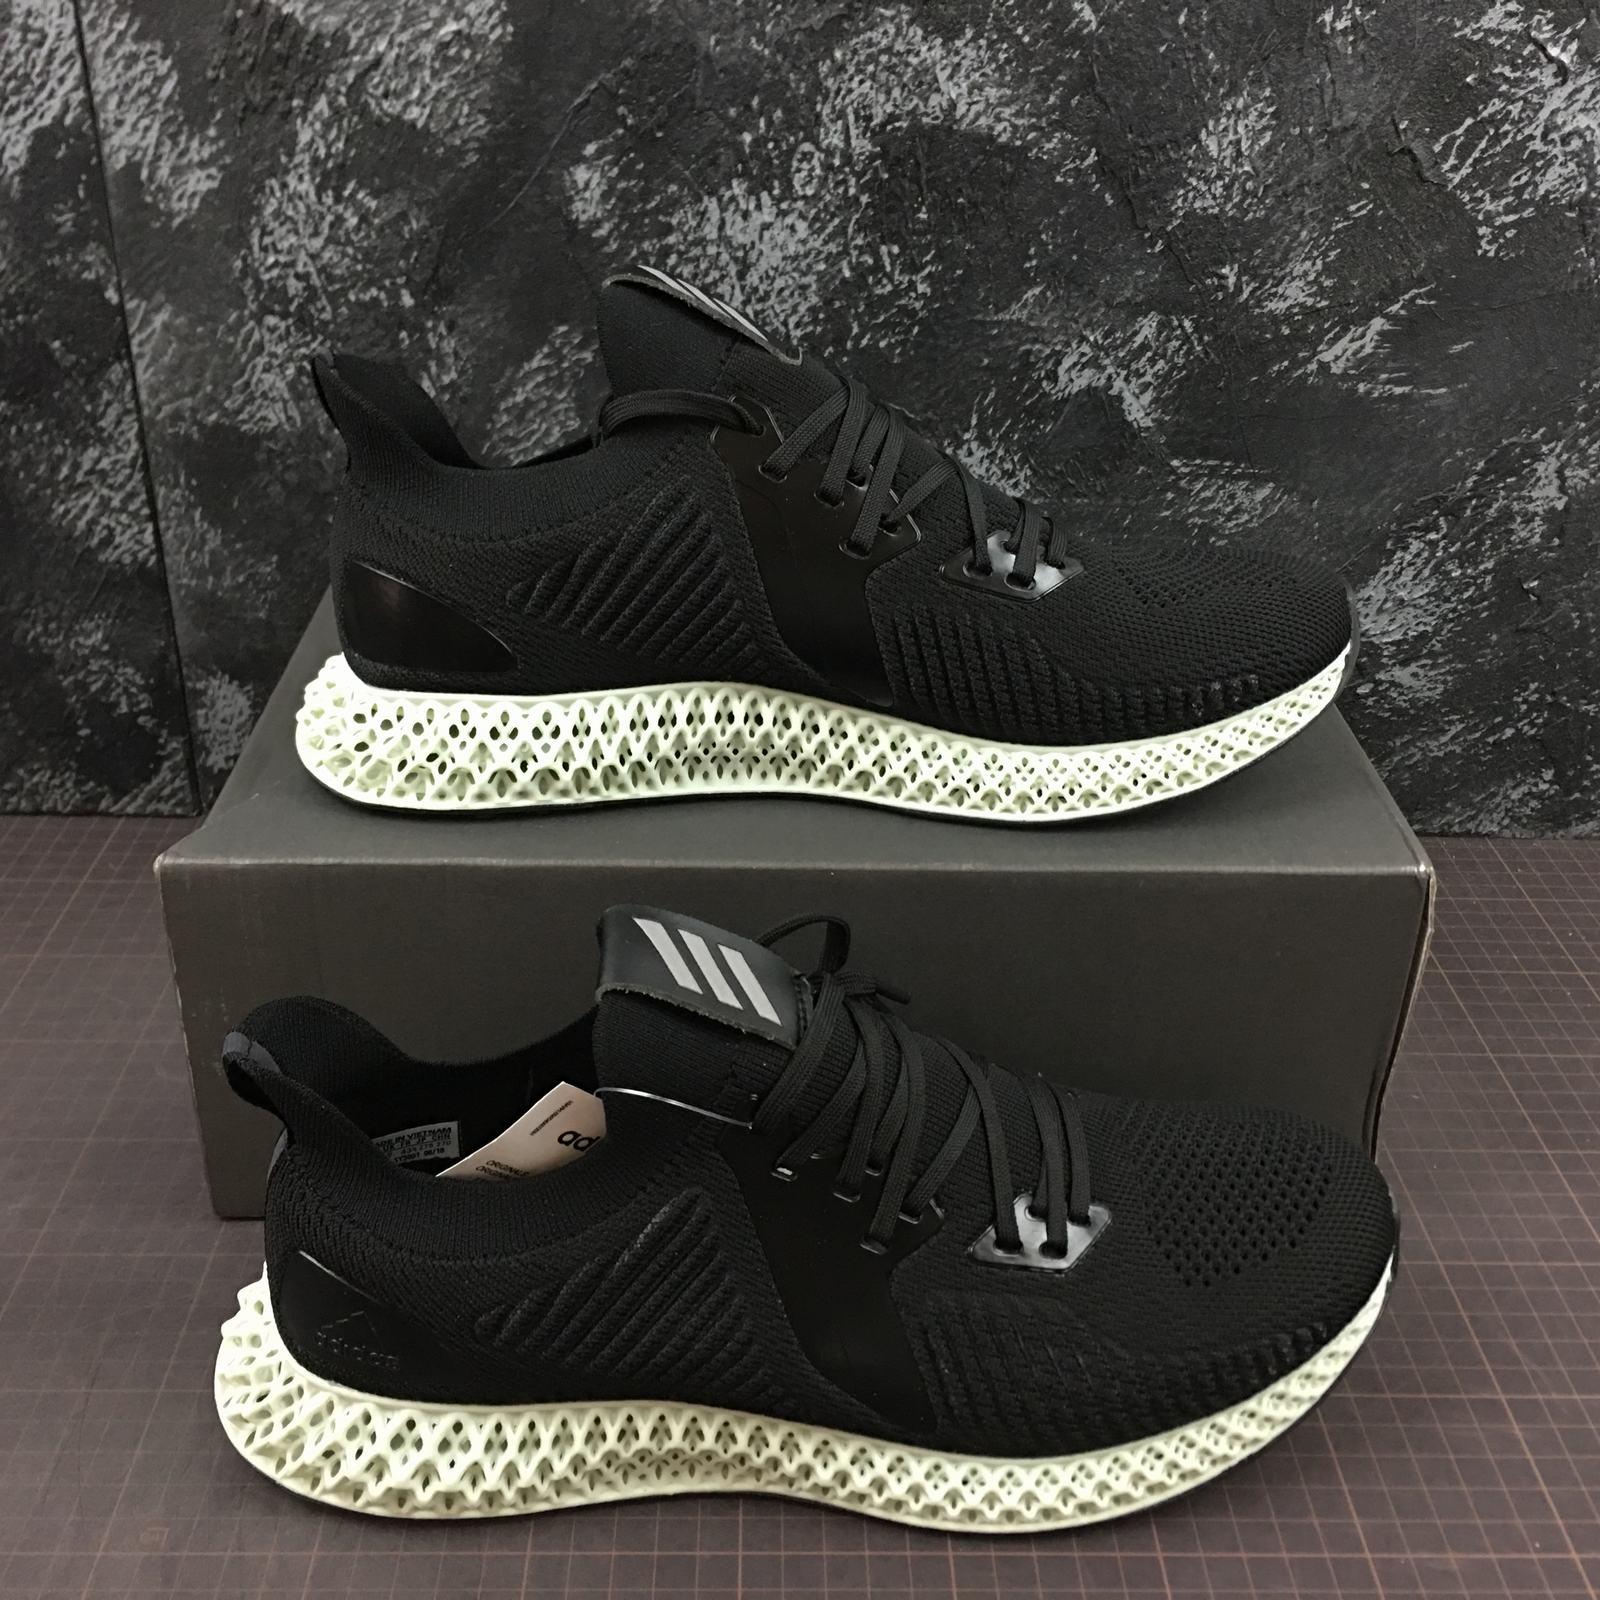 giay-sneaker-adidas-futurecraft-4d-ef3453-black